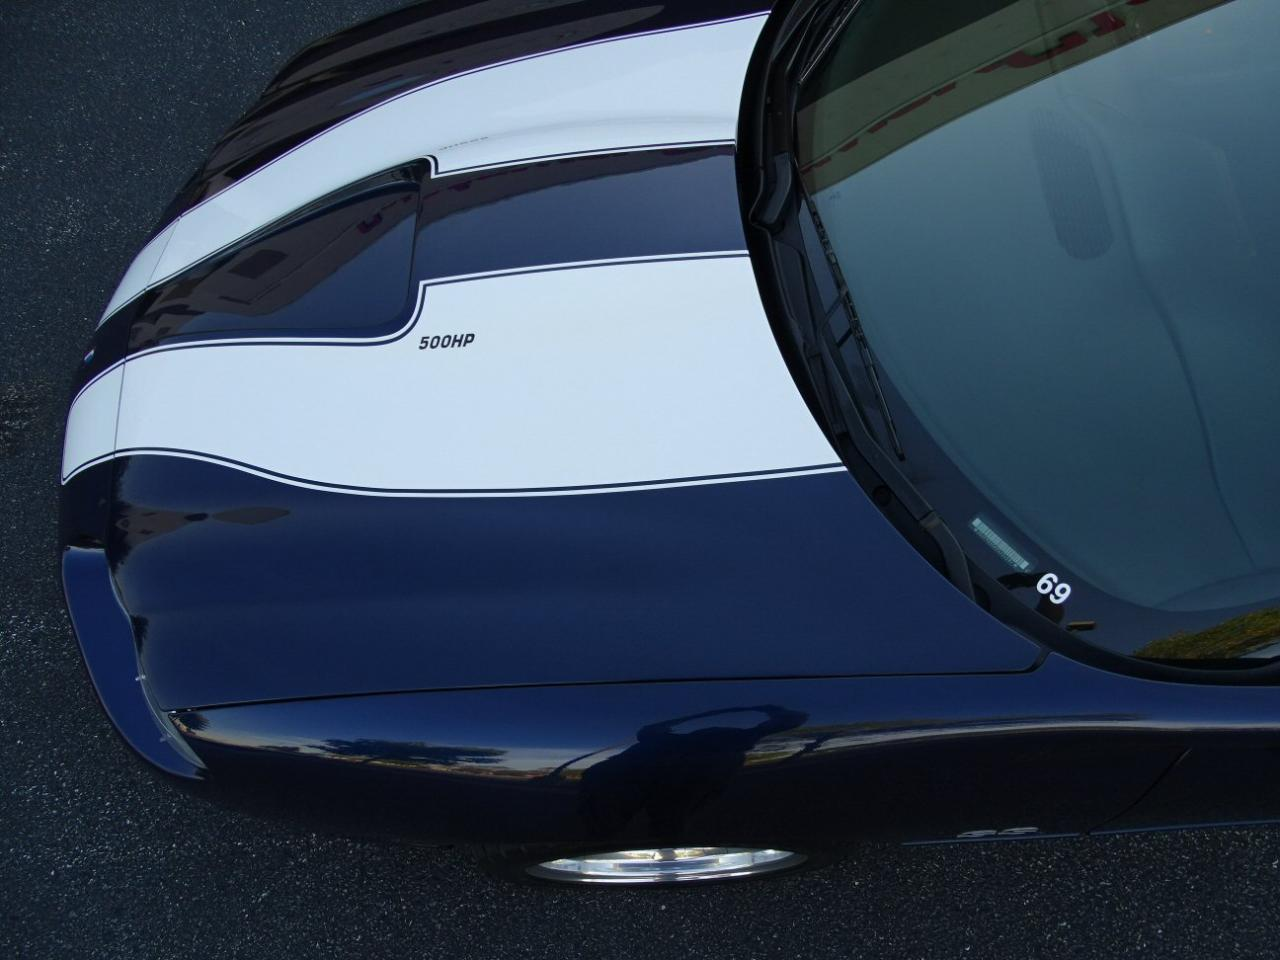 Large Picture of '02 Chevrolet Camaro located in O'Fallon Illinois - $53,000.00 - KDSG